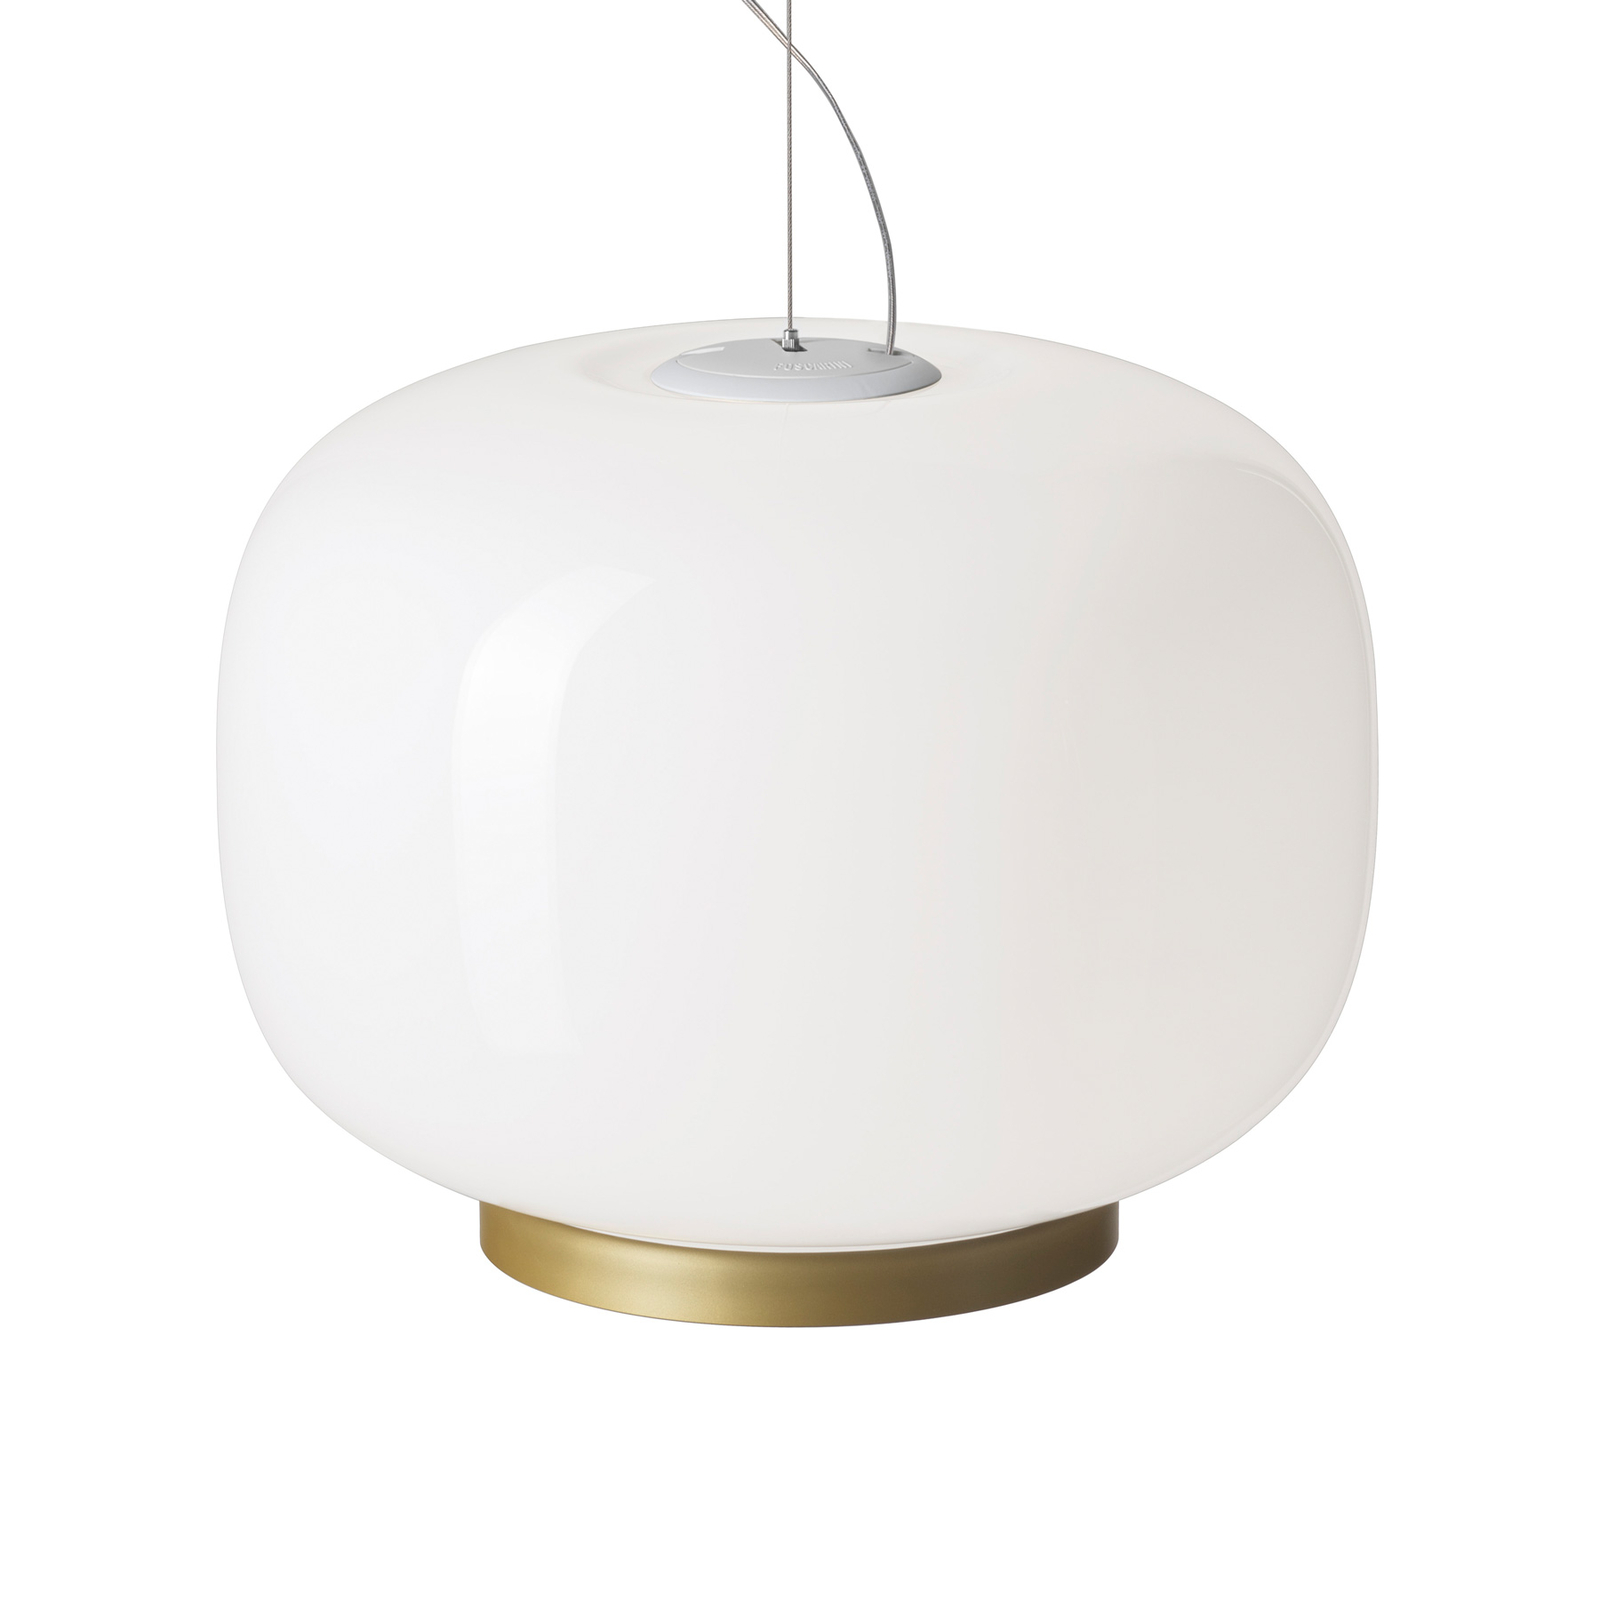 Foscarini Chouchin Reverse 1 E27 LED gold/weiß